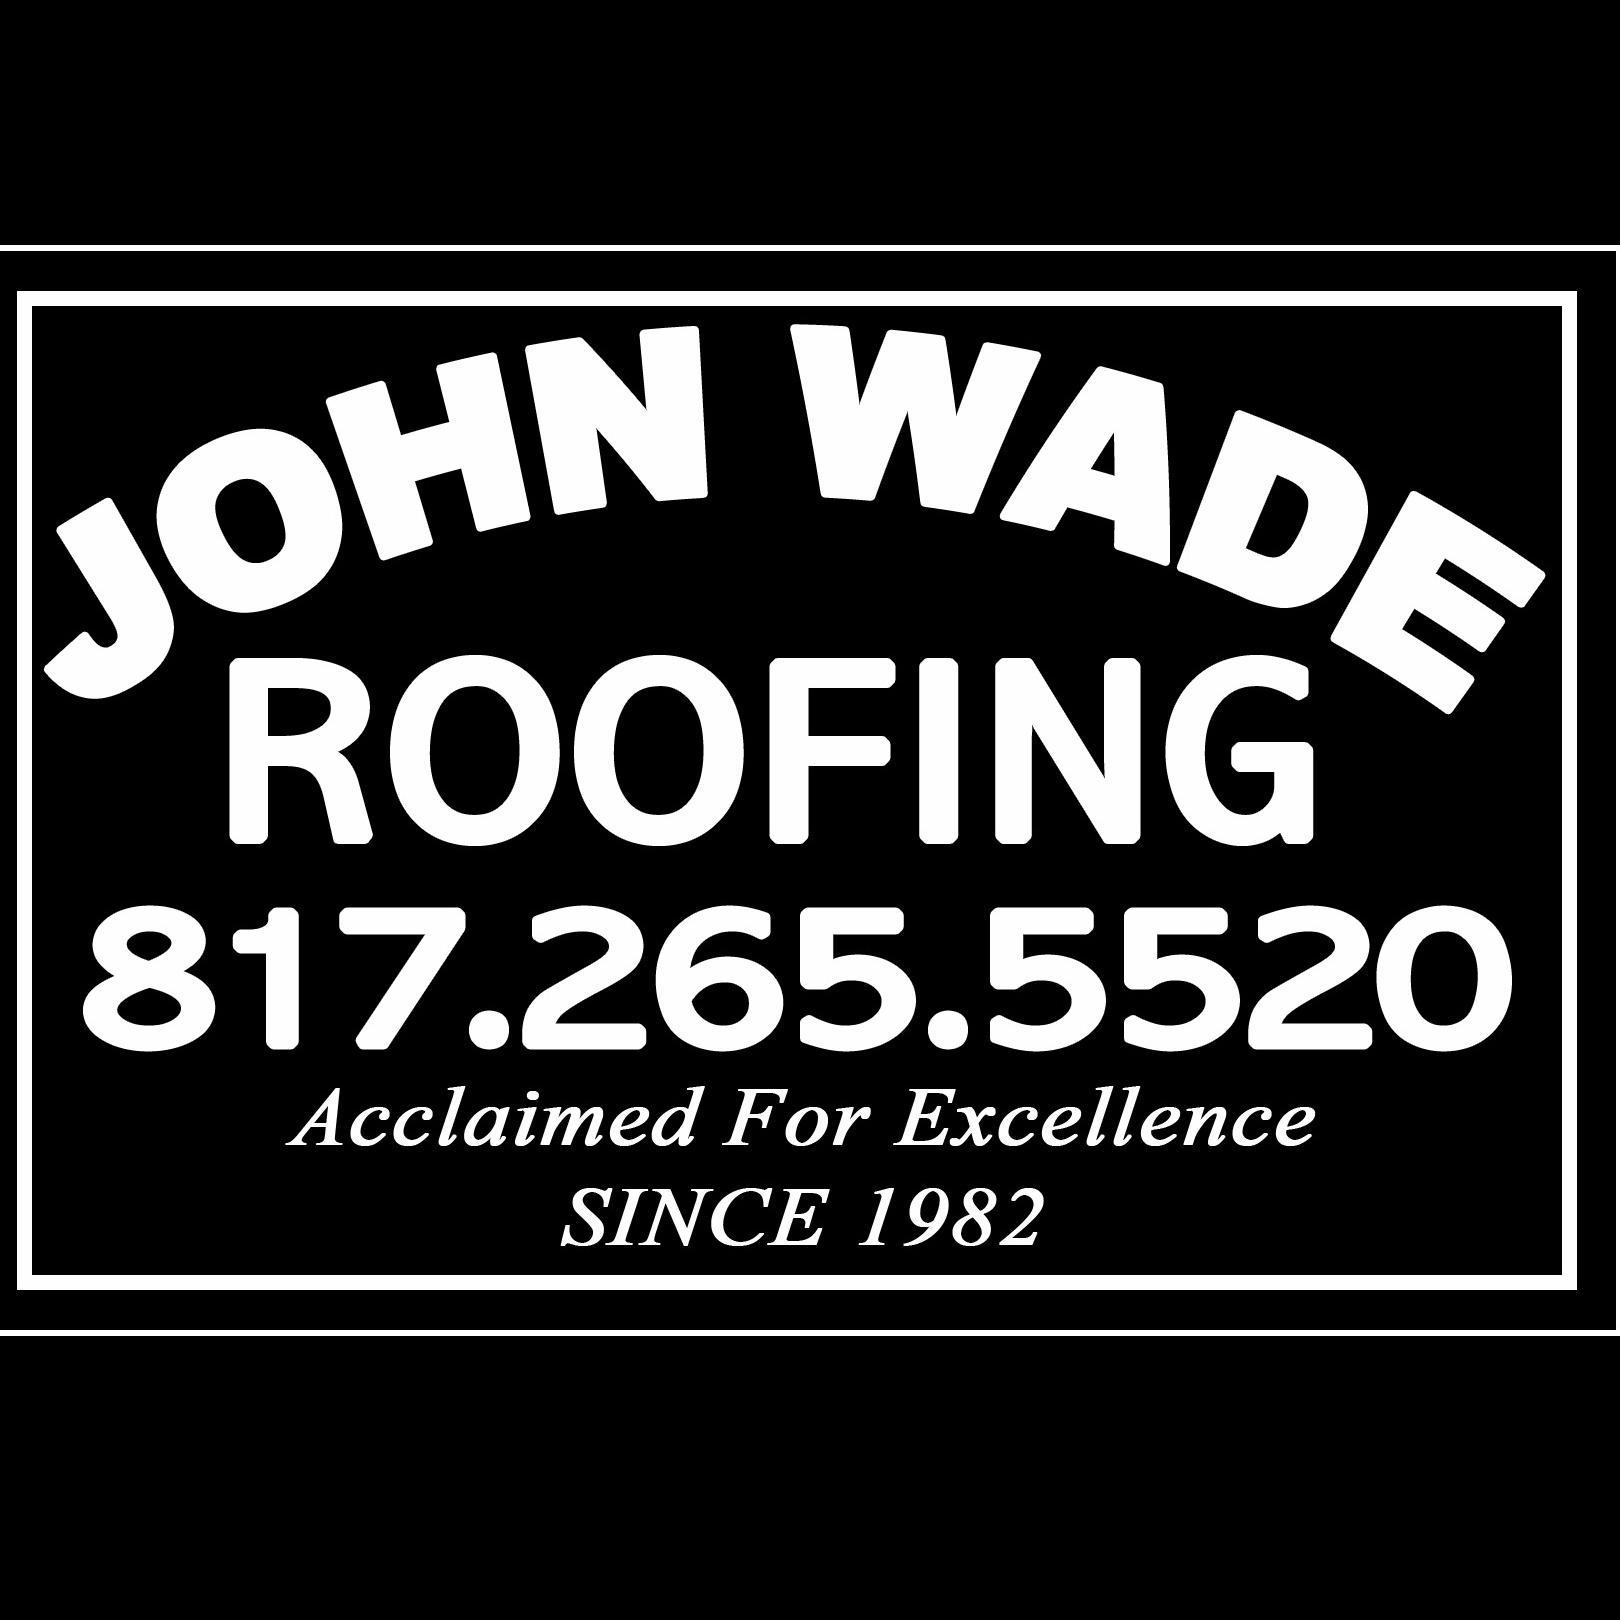 JOHN WADE ROOFING